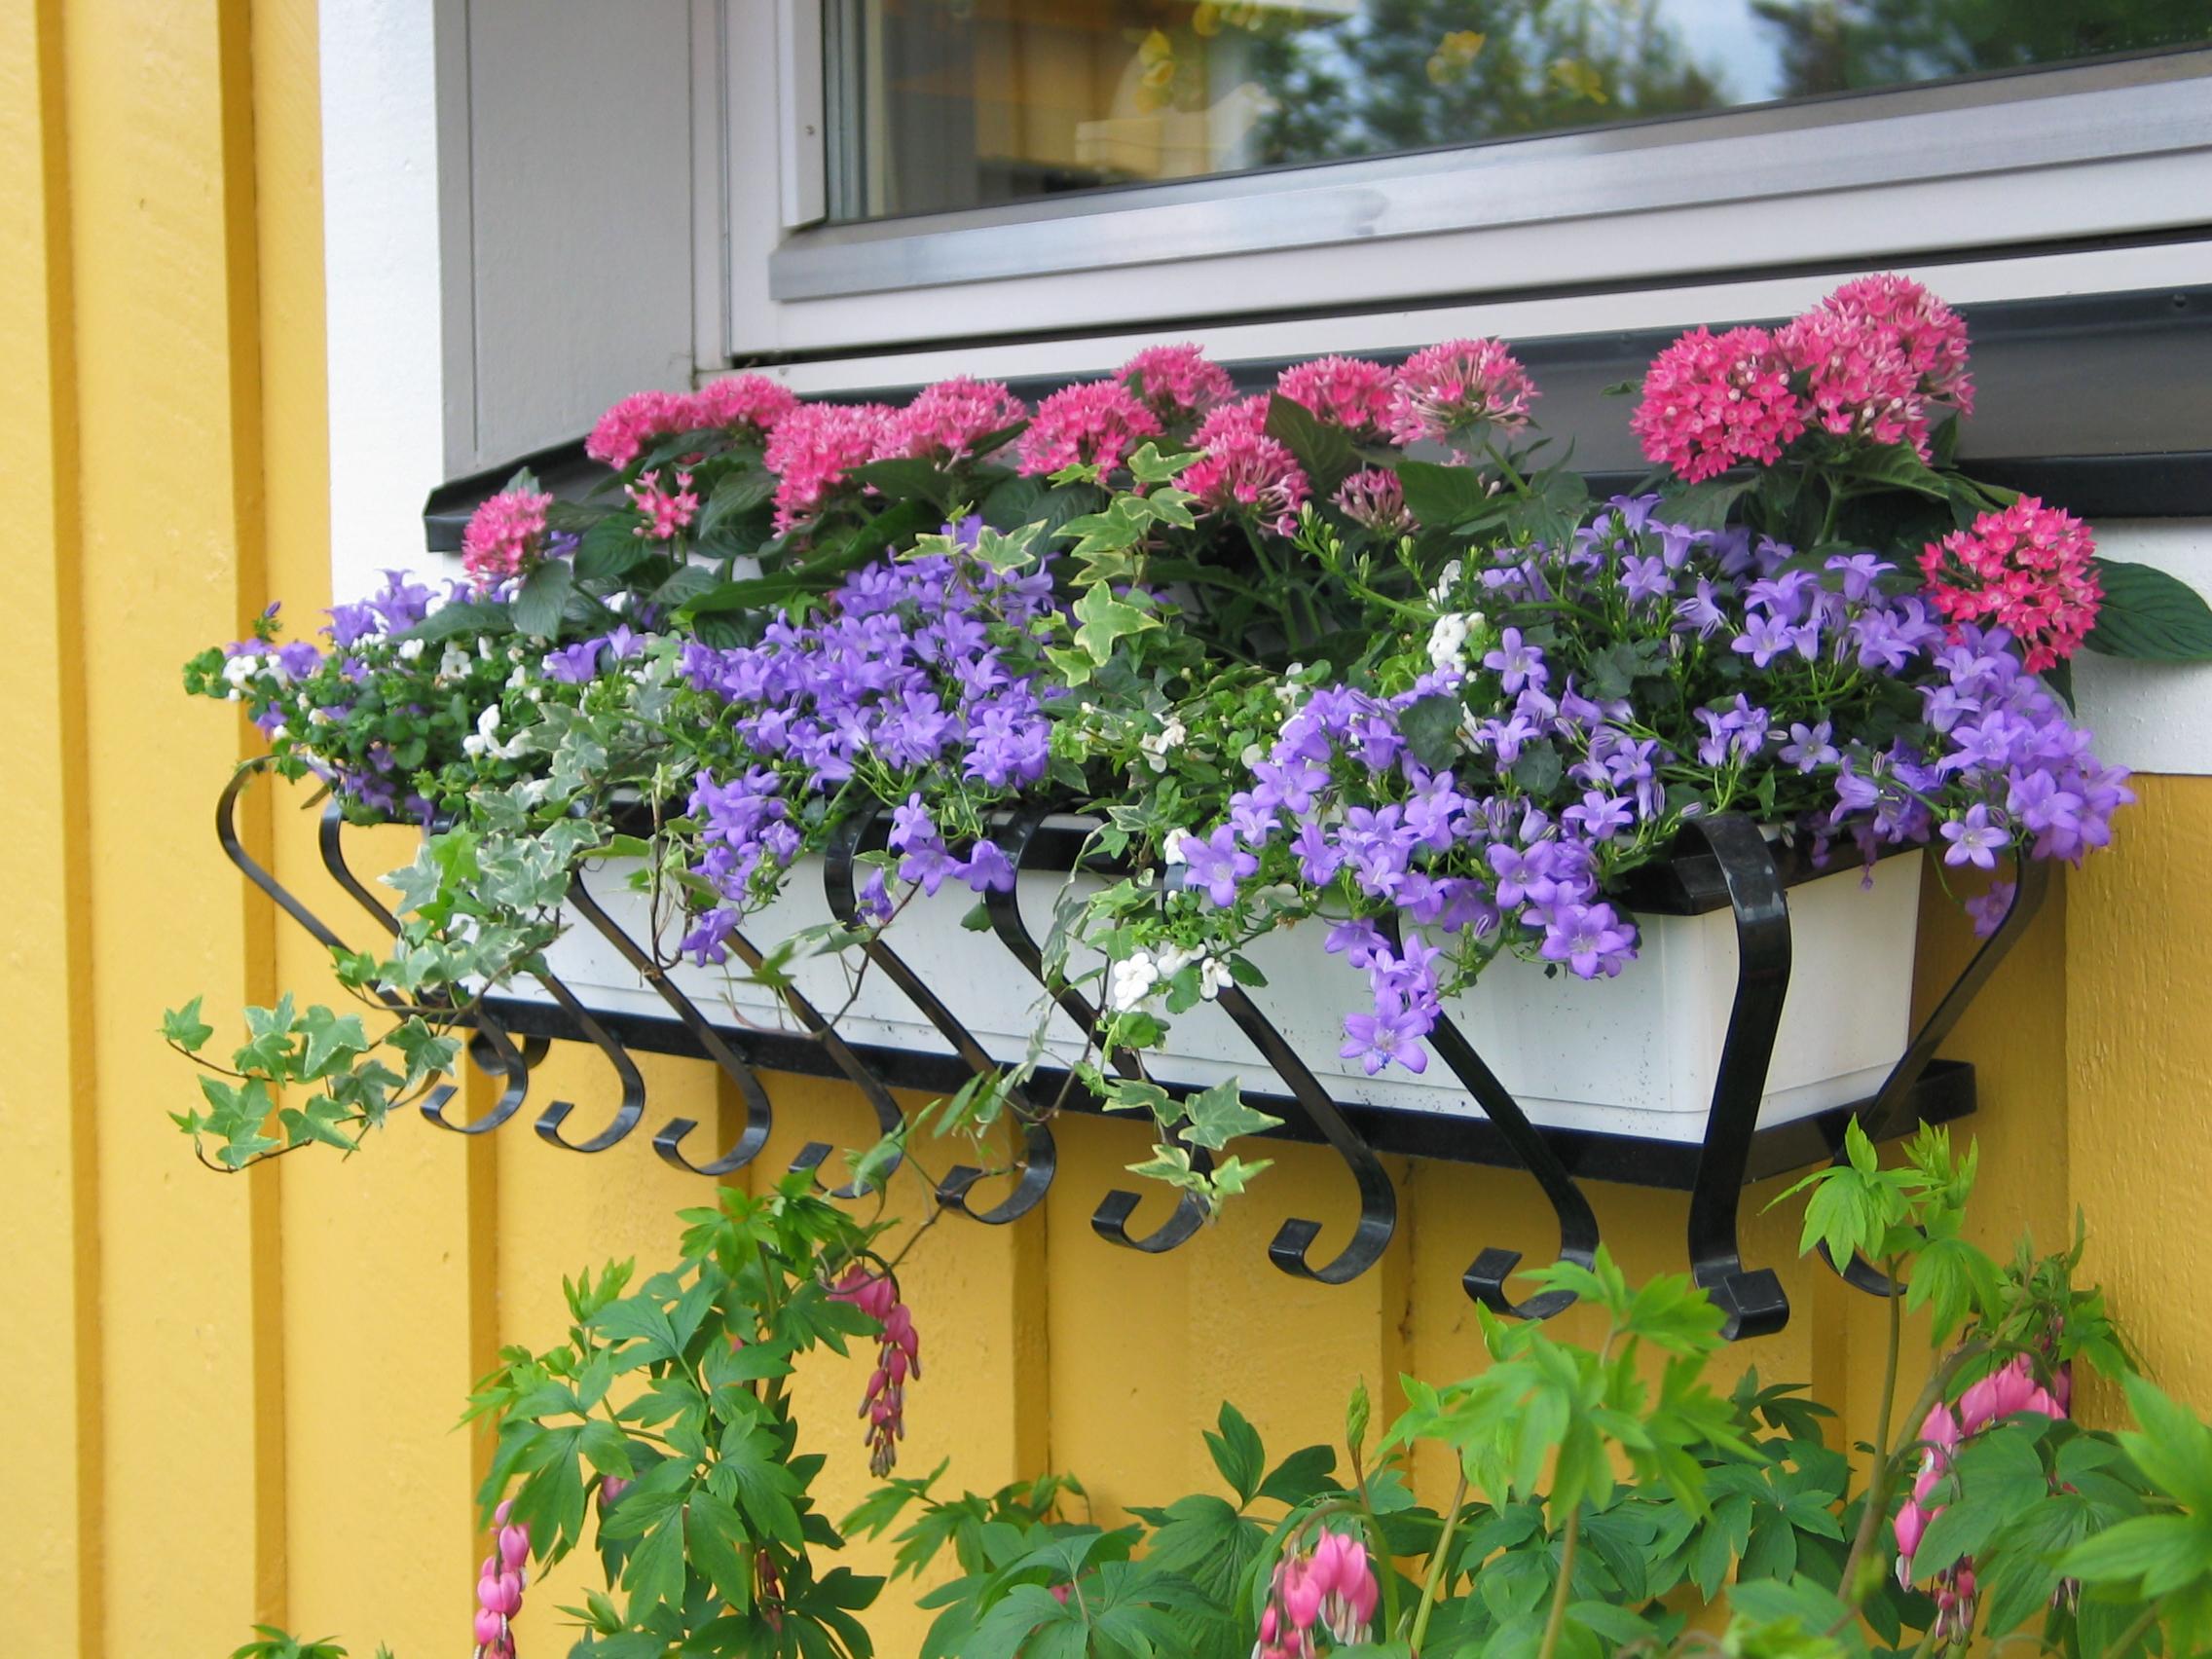 blommor till balkonglådor